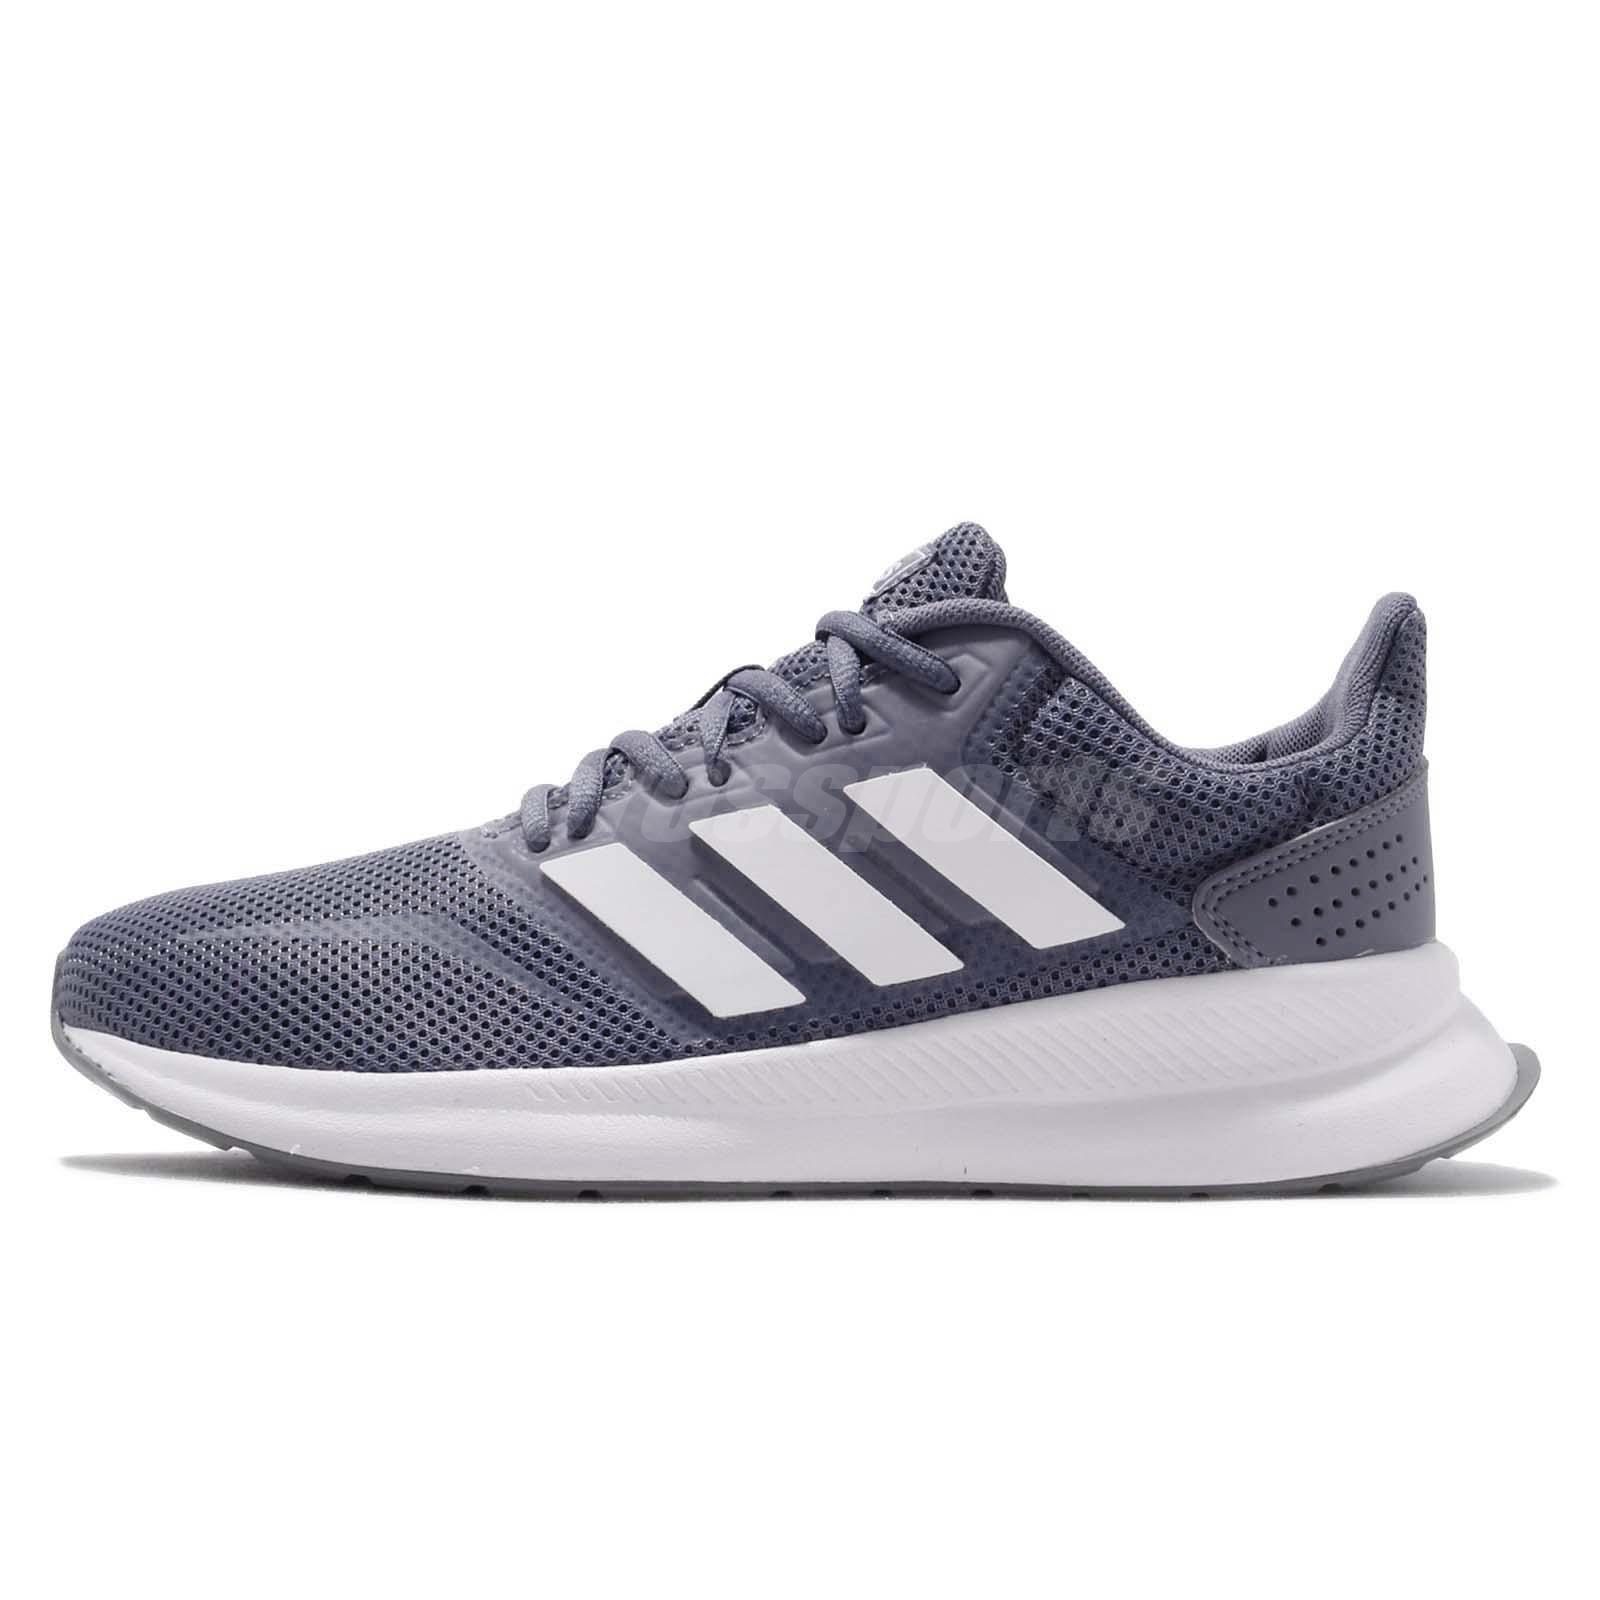 new product c8f9e ddfaa adidas Runfalcon Raw Indigo White Grey Women Running Casual Shoes Sneaker  F36217